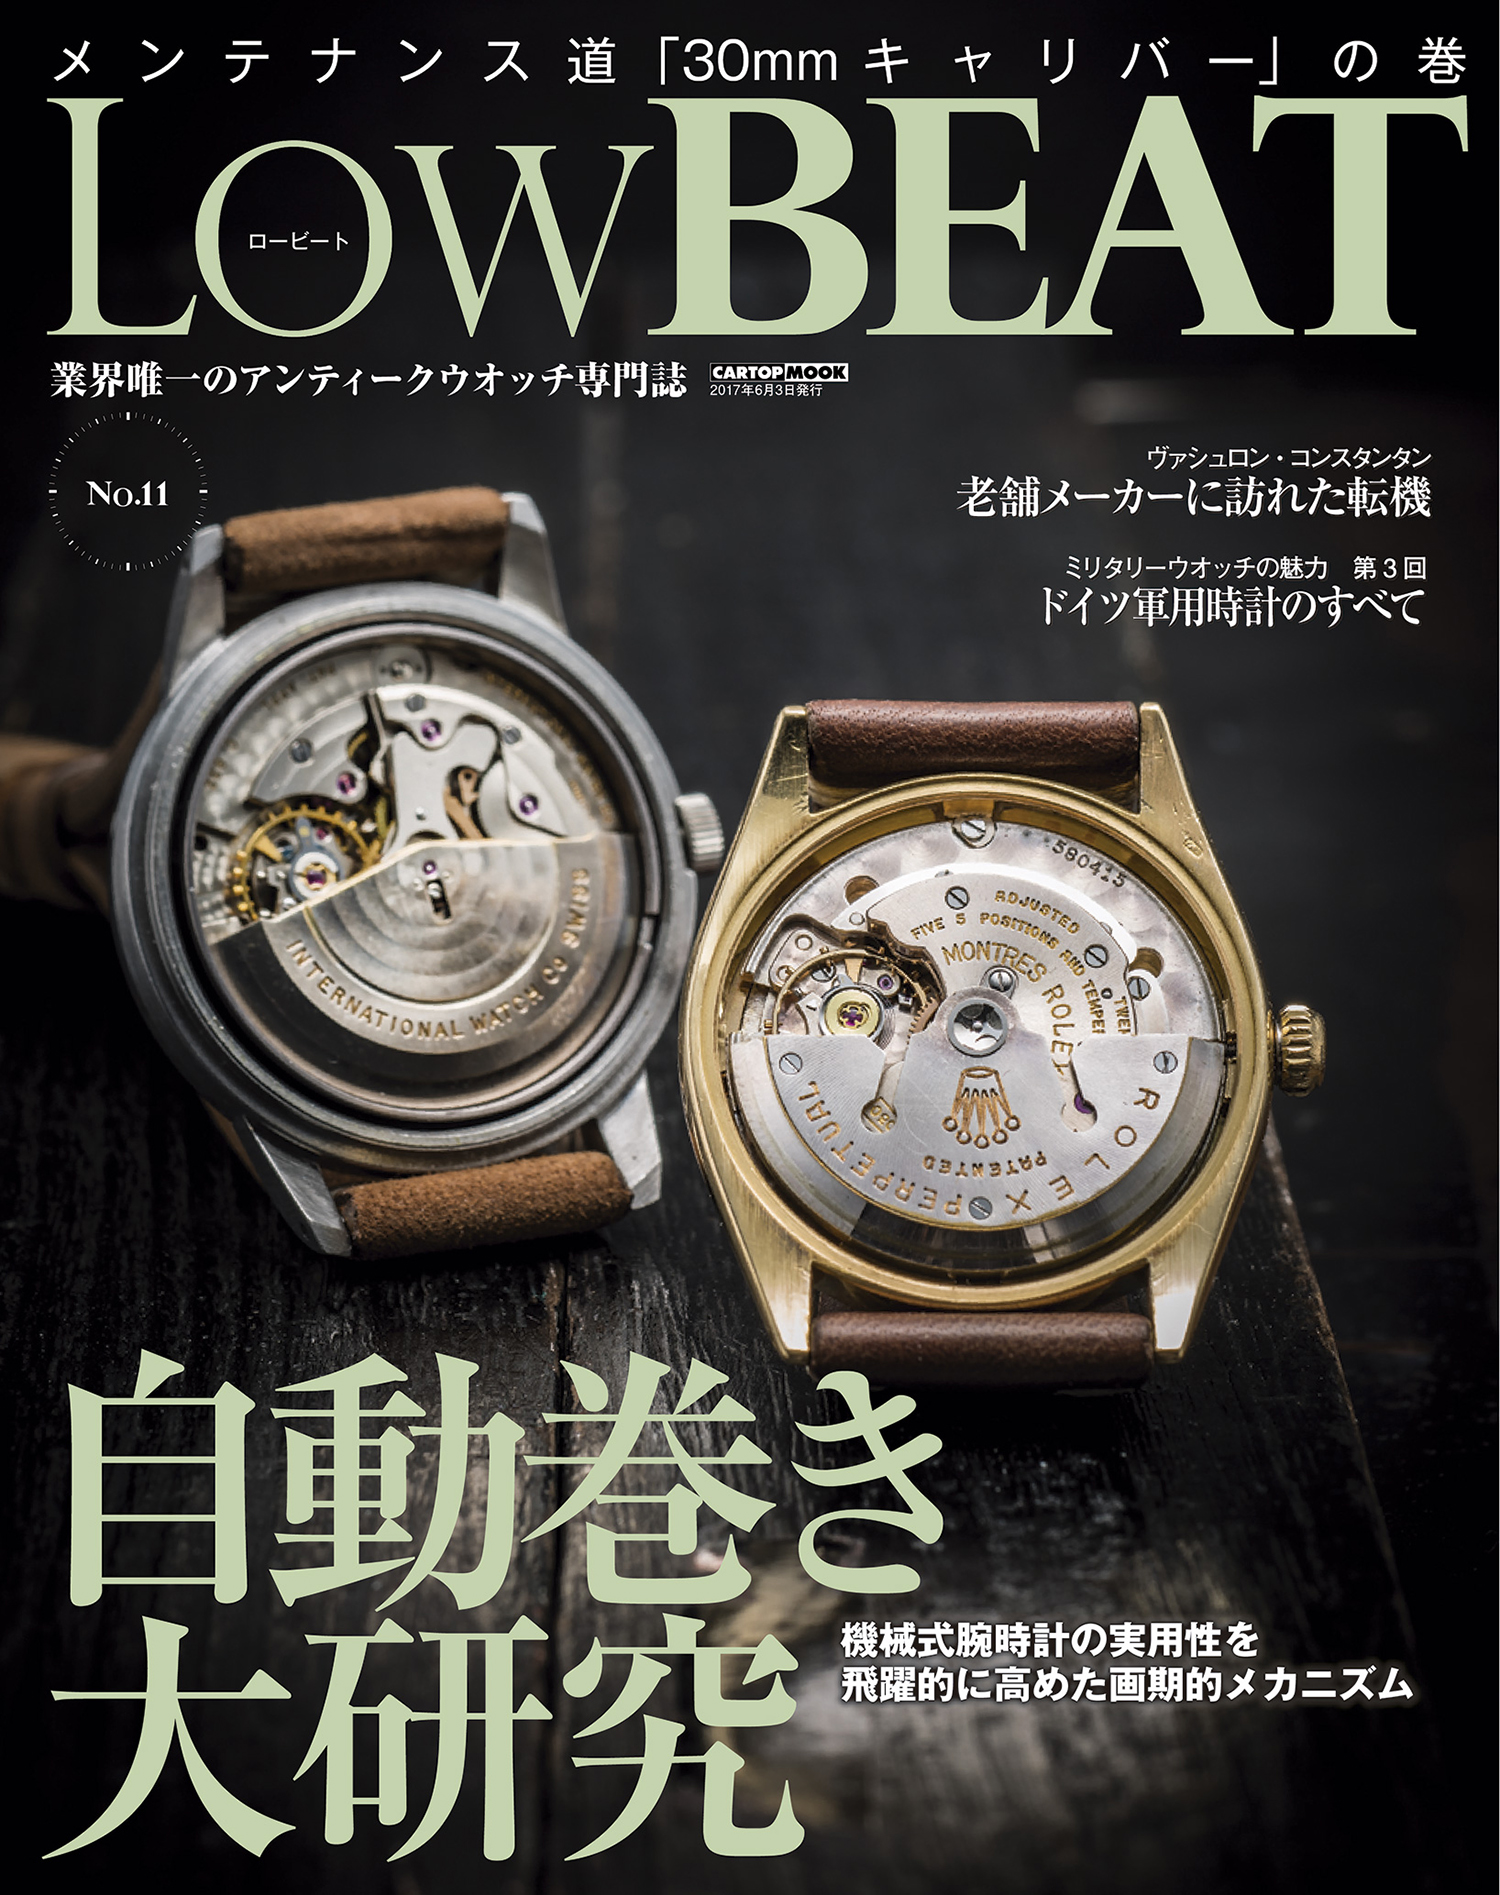 C's-Factory|電子書籍|LOW BEAT No.11